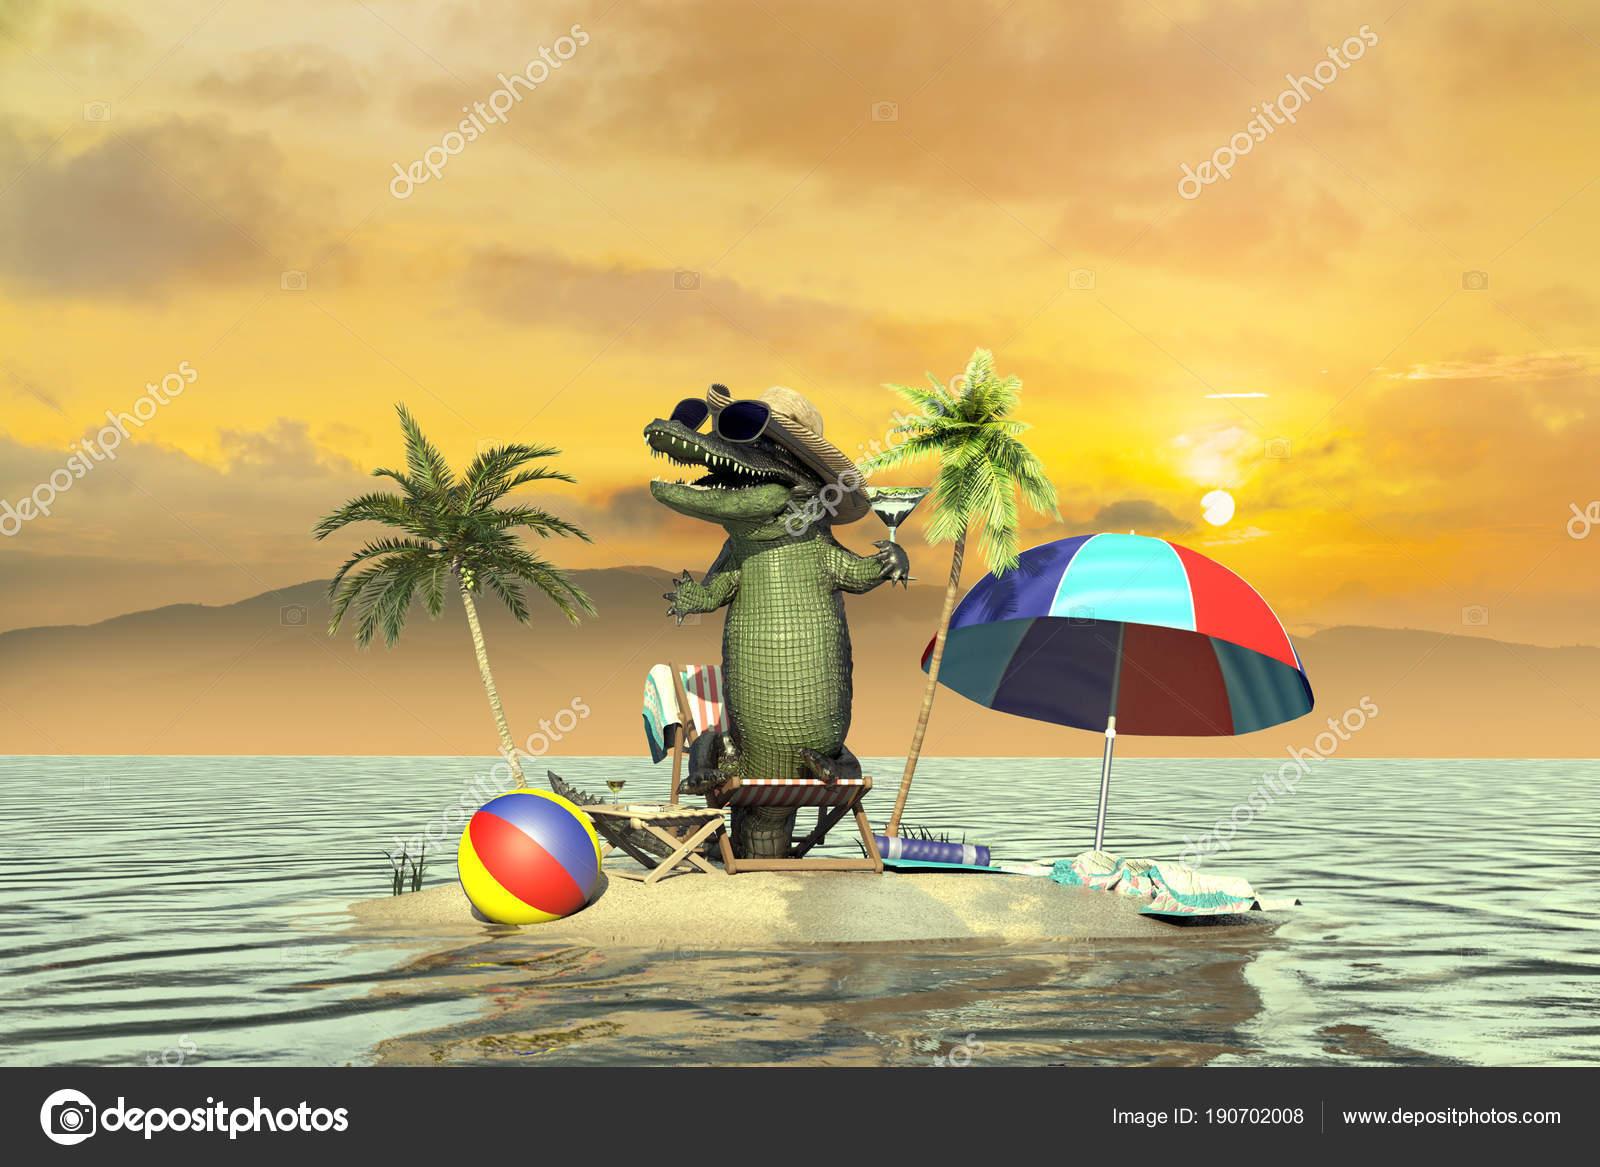 Illustration Funny Crocodile Resting Resort Beach Stock Photo C Denissmile 190702008